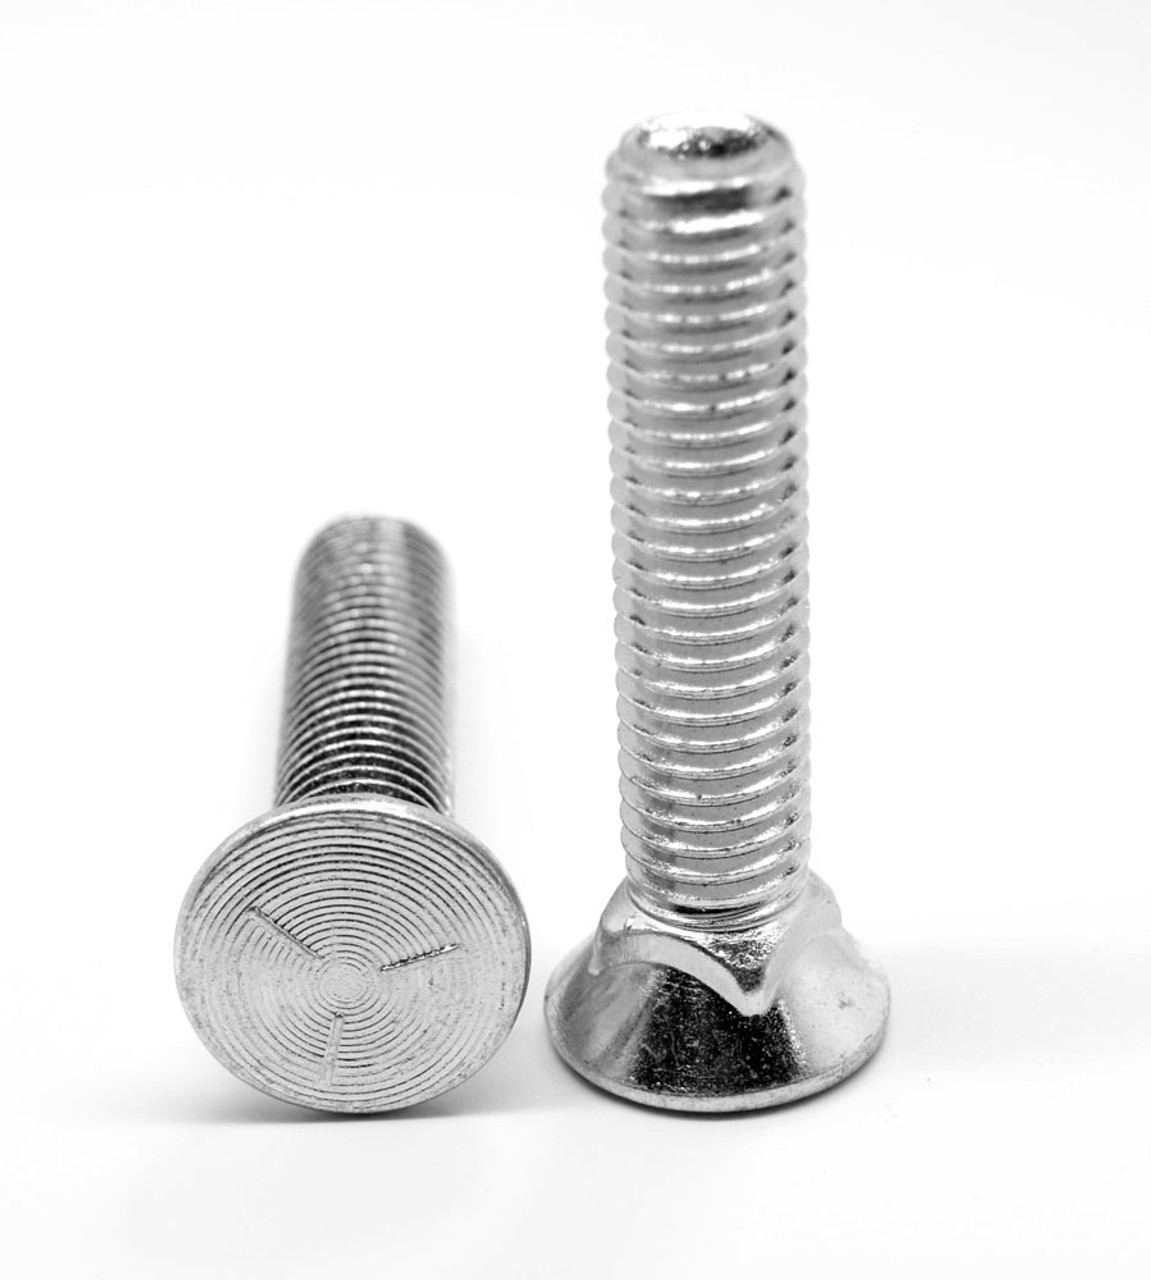 3/4-10 x 2 1/2 (FT) Coarse Thread Grade 8 Plow Bolt #3 Flat Head Medium Carbon Steel Yellow Zinc Plated